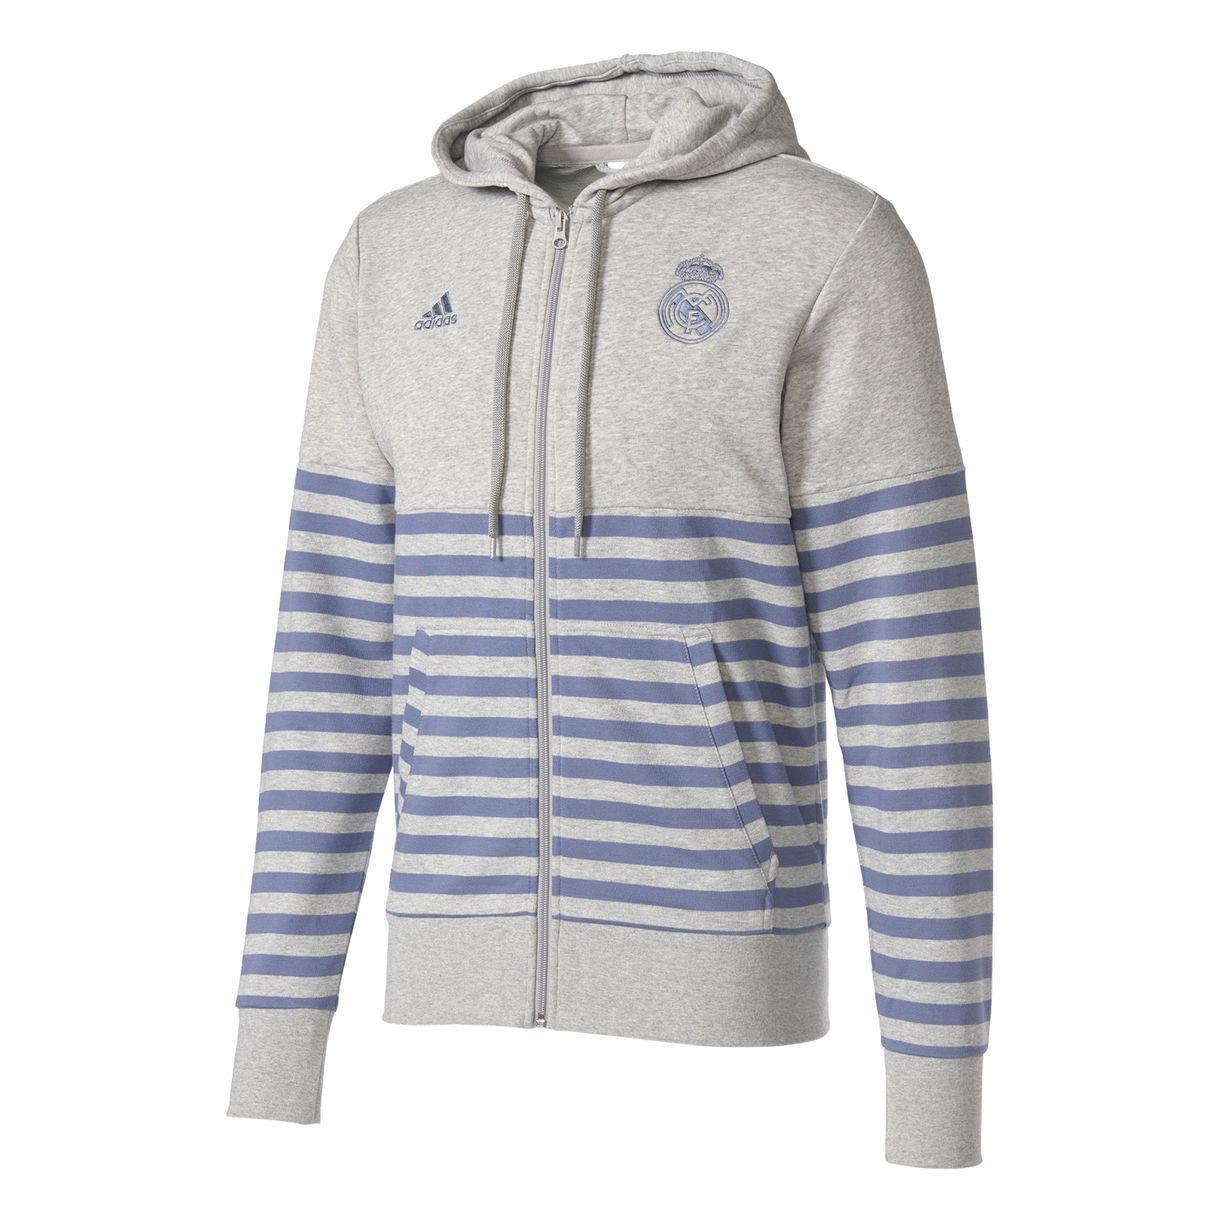 64b479532548 Adidas Real Madrid Hoodie FZ - Medium Grey Heather   Super Purple. Friday